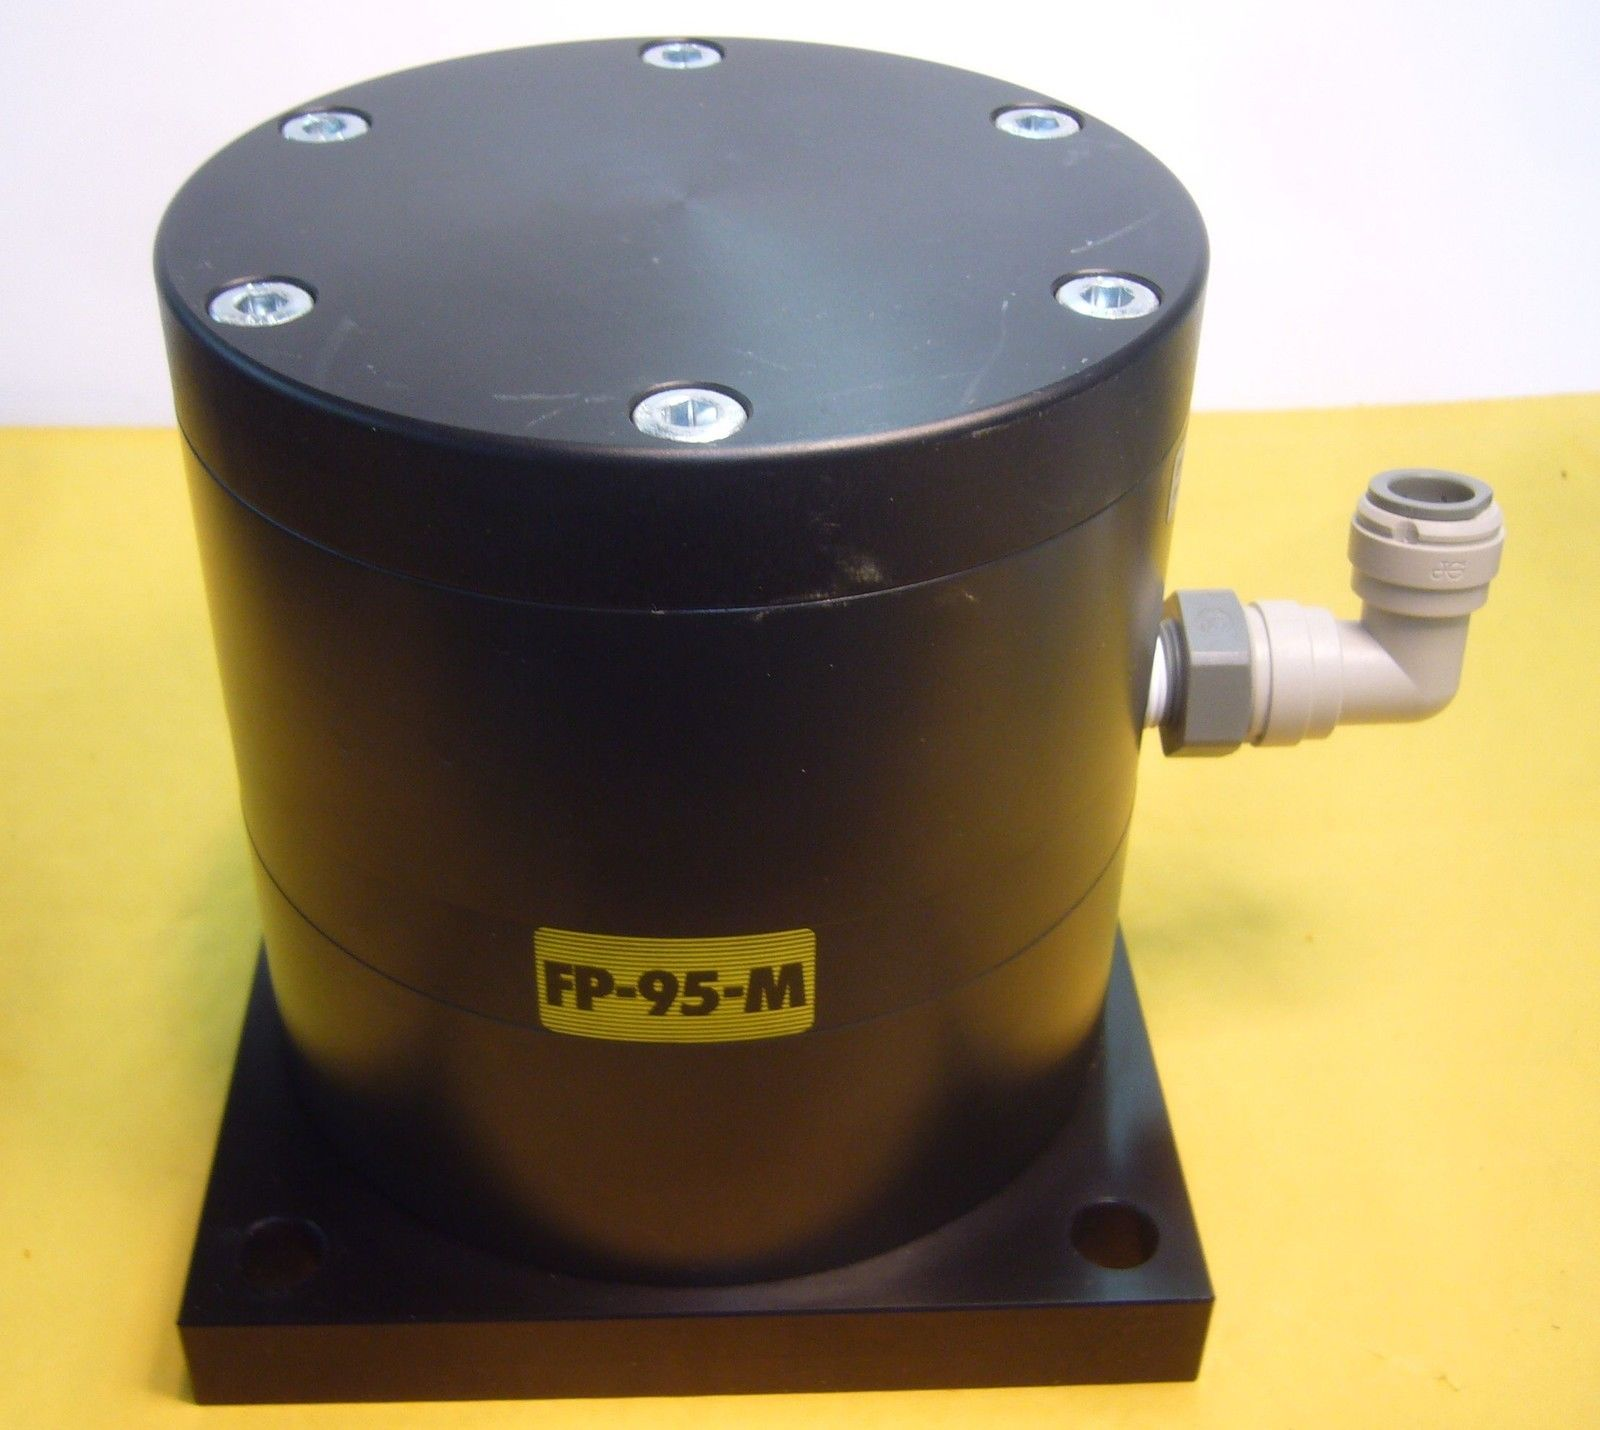 FP-95-M参数与尺寸介绍点击进入